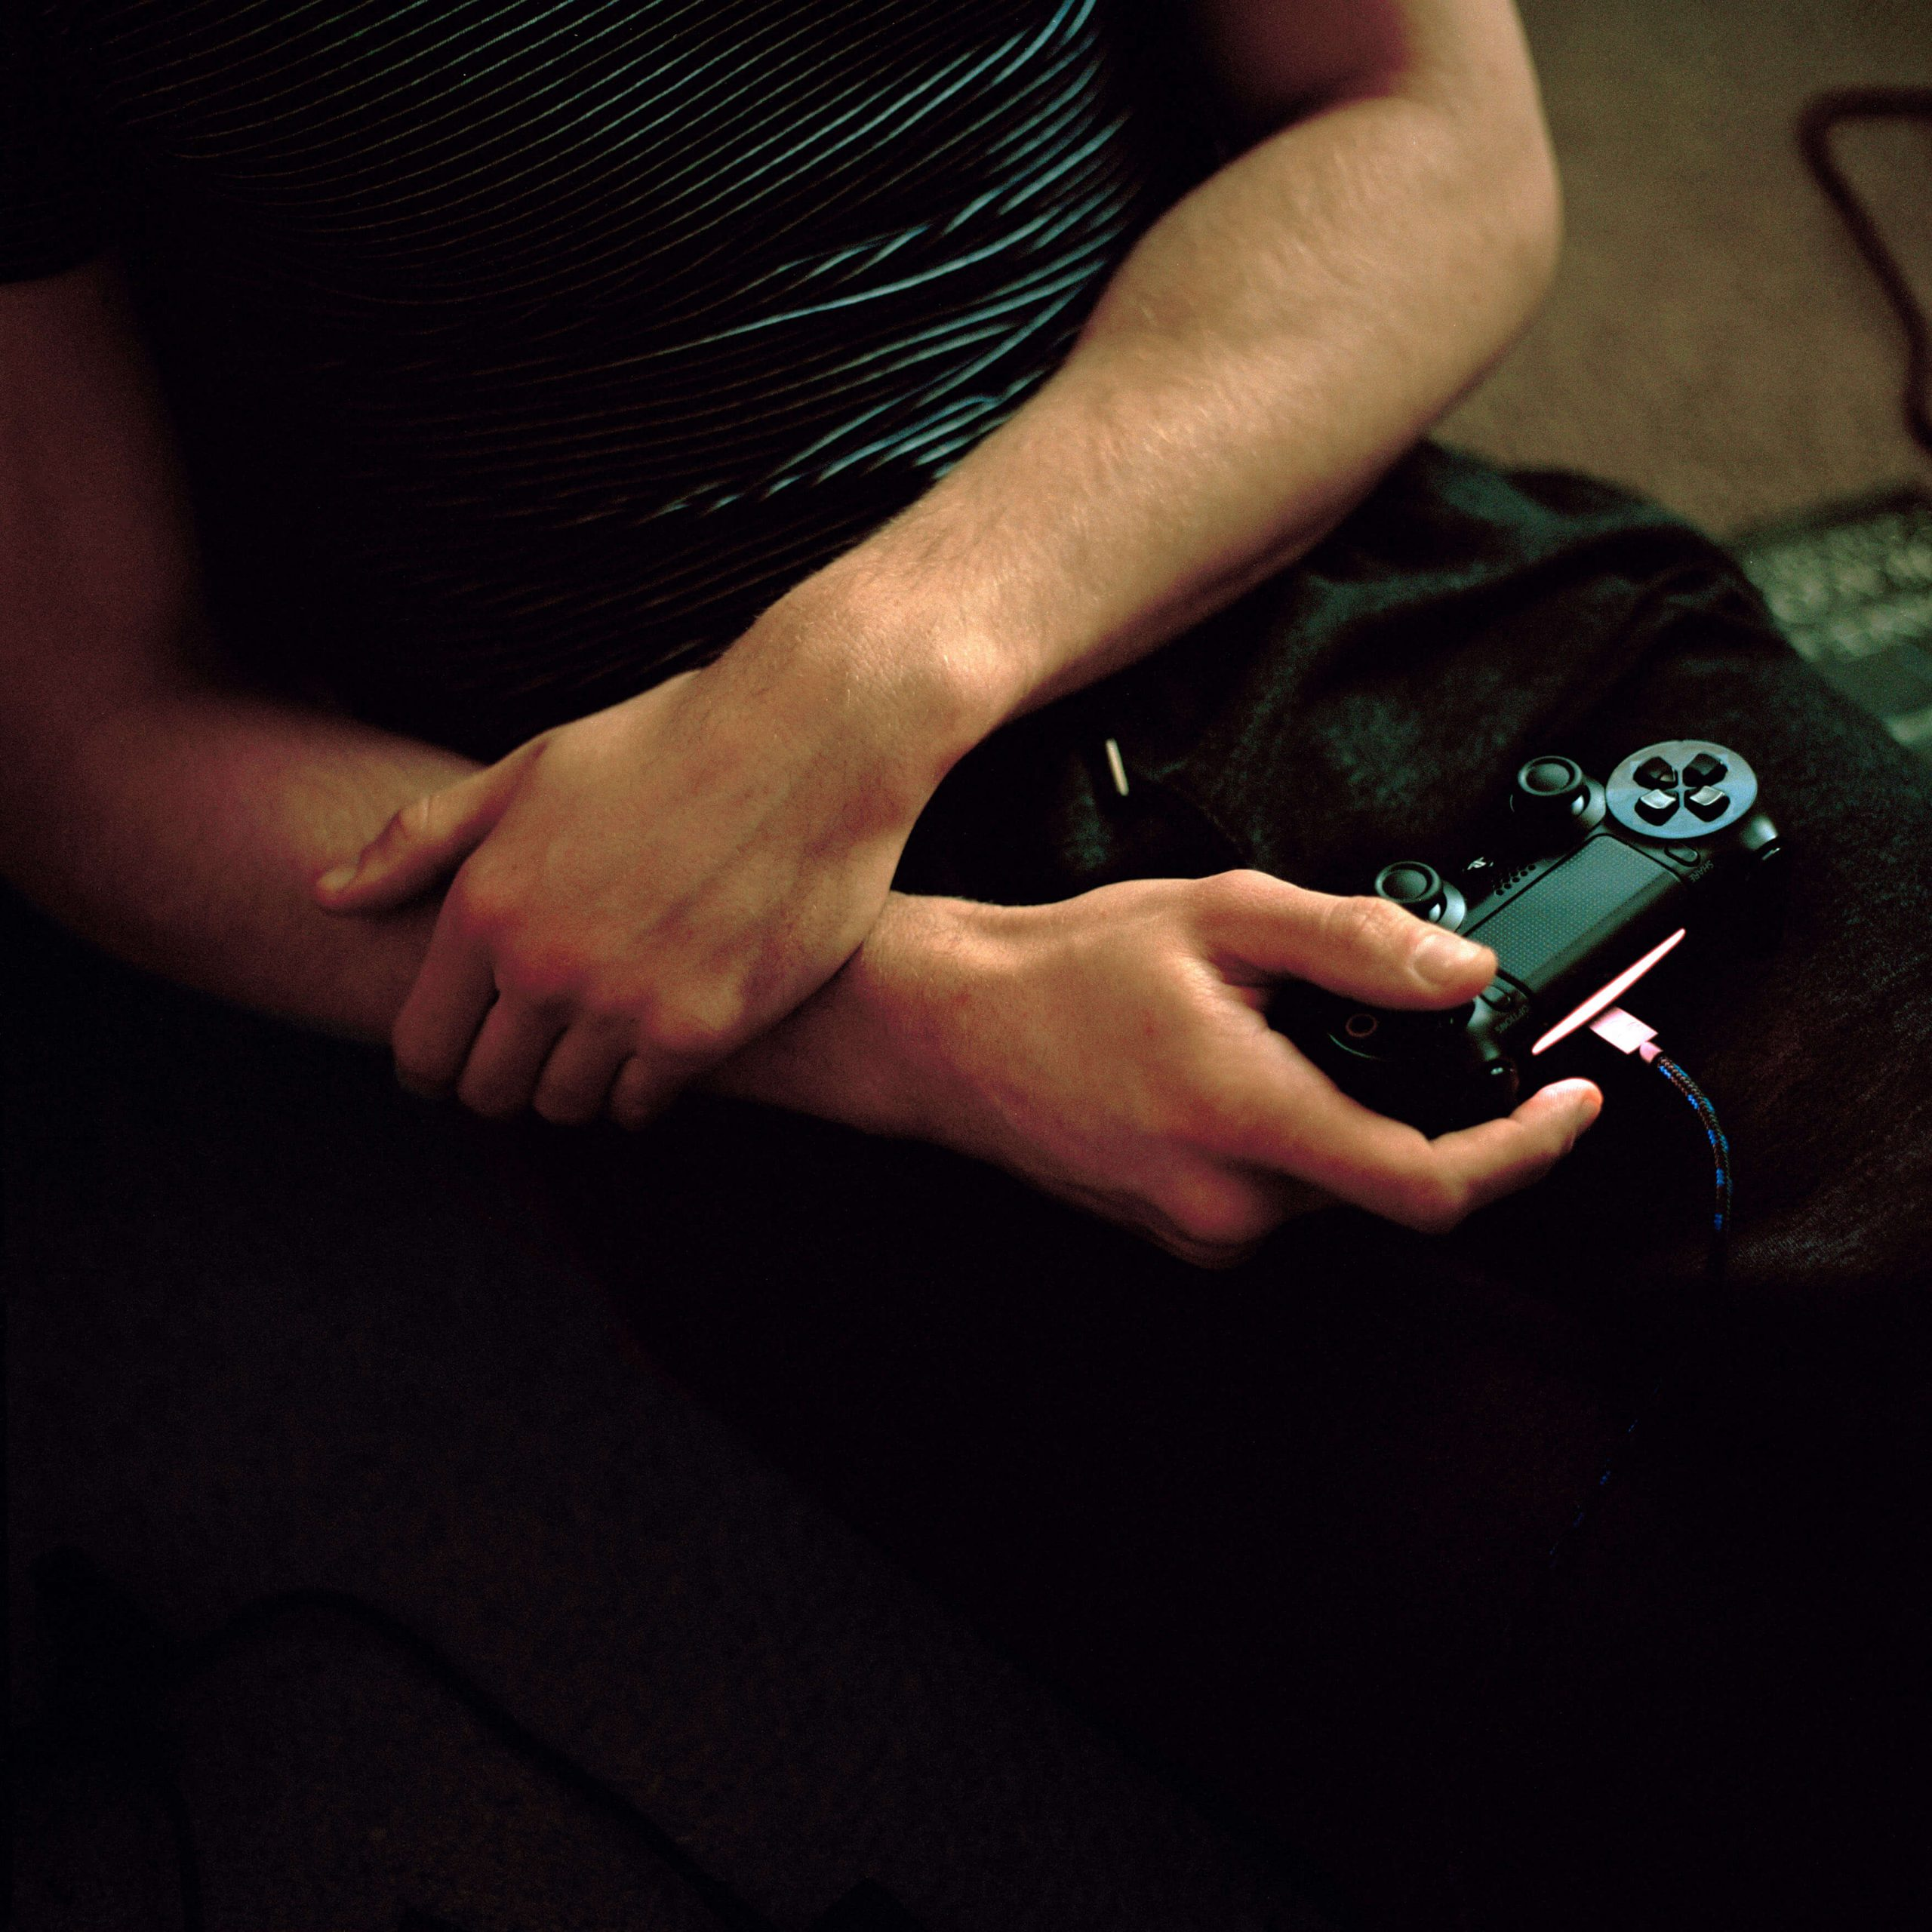 Léa Mariella - Jamie man playing playstation